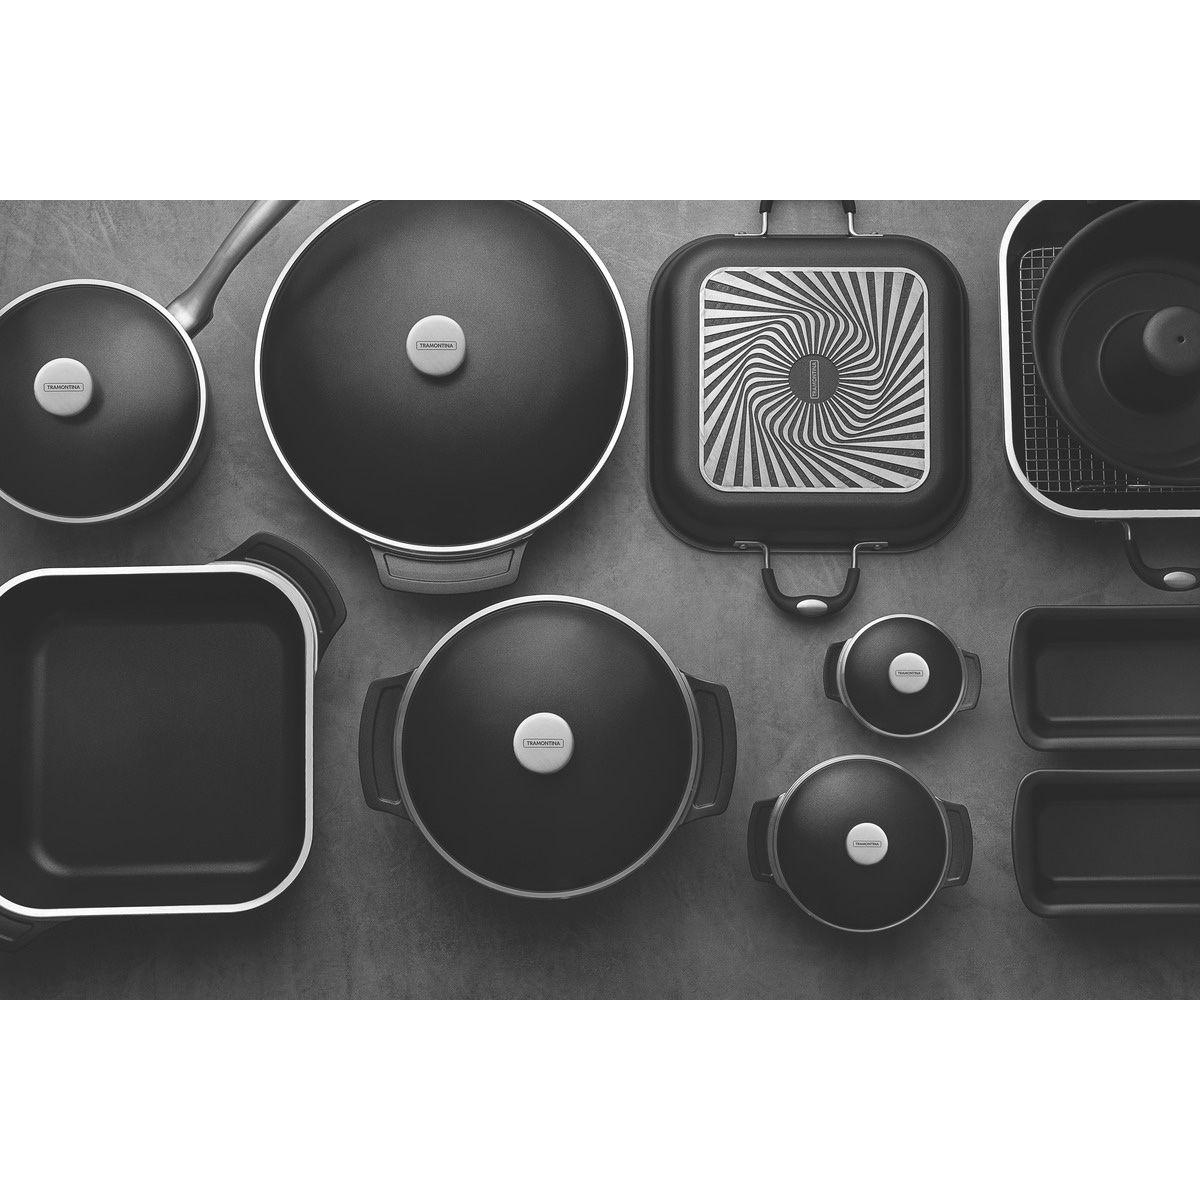 Kit Tramontina Lyon 360 em Alumínio Forjado com Revestimento Interno Antiaderente Starflon T5 Preto 6 Peças